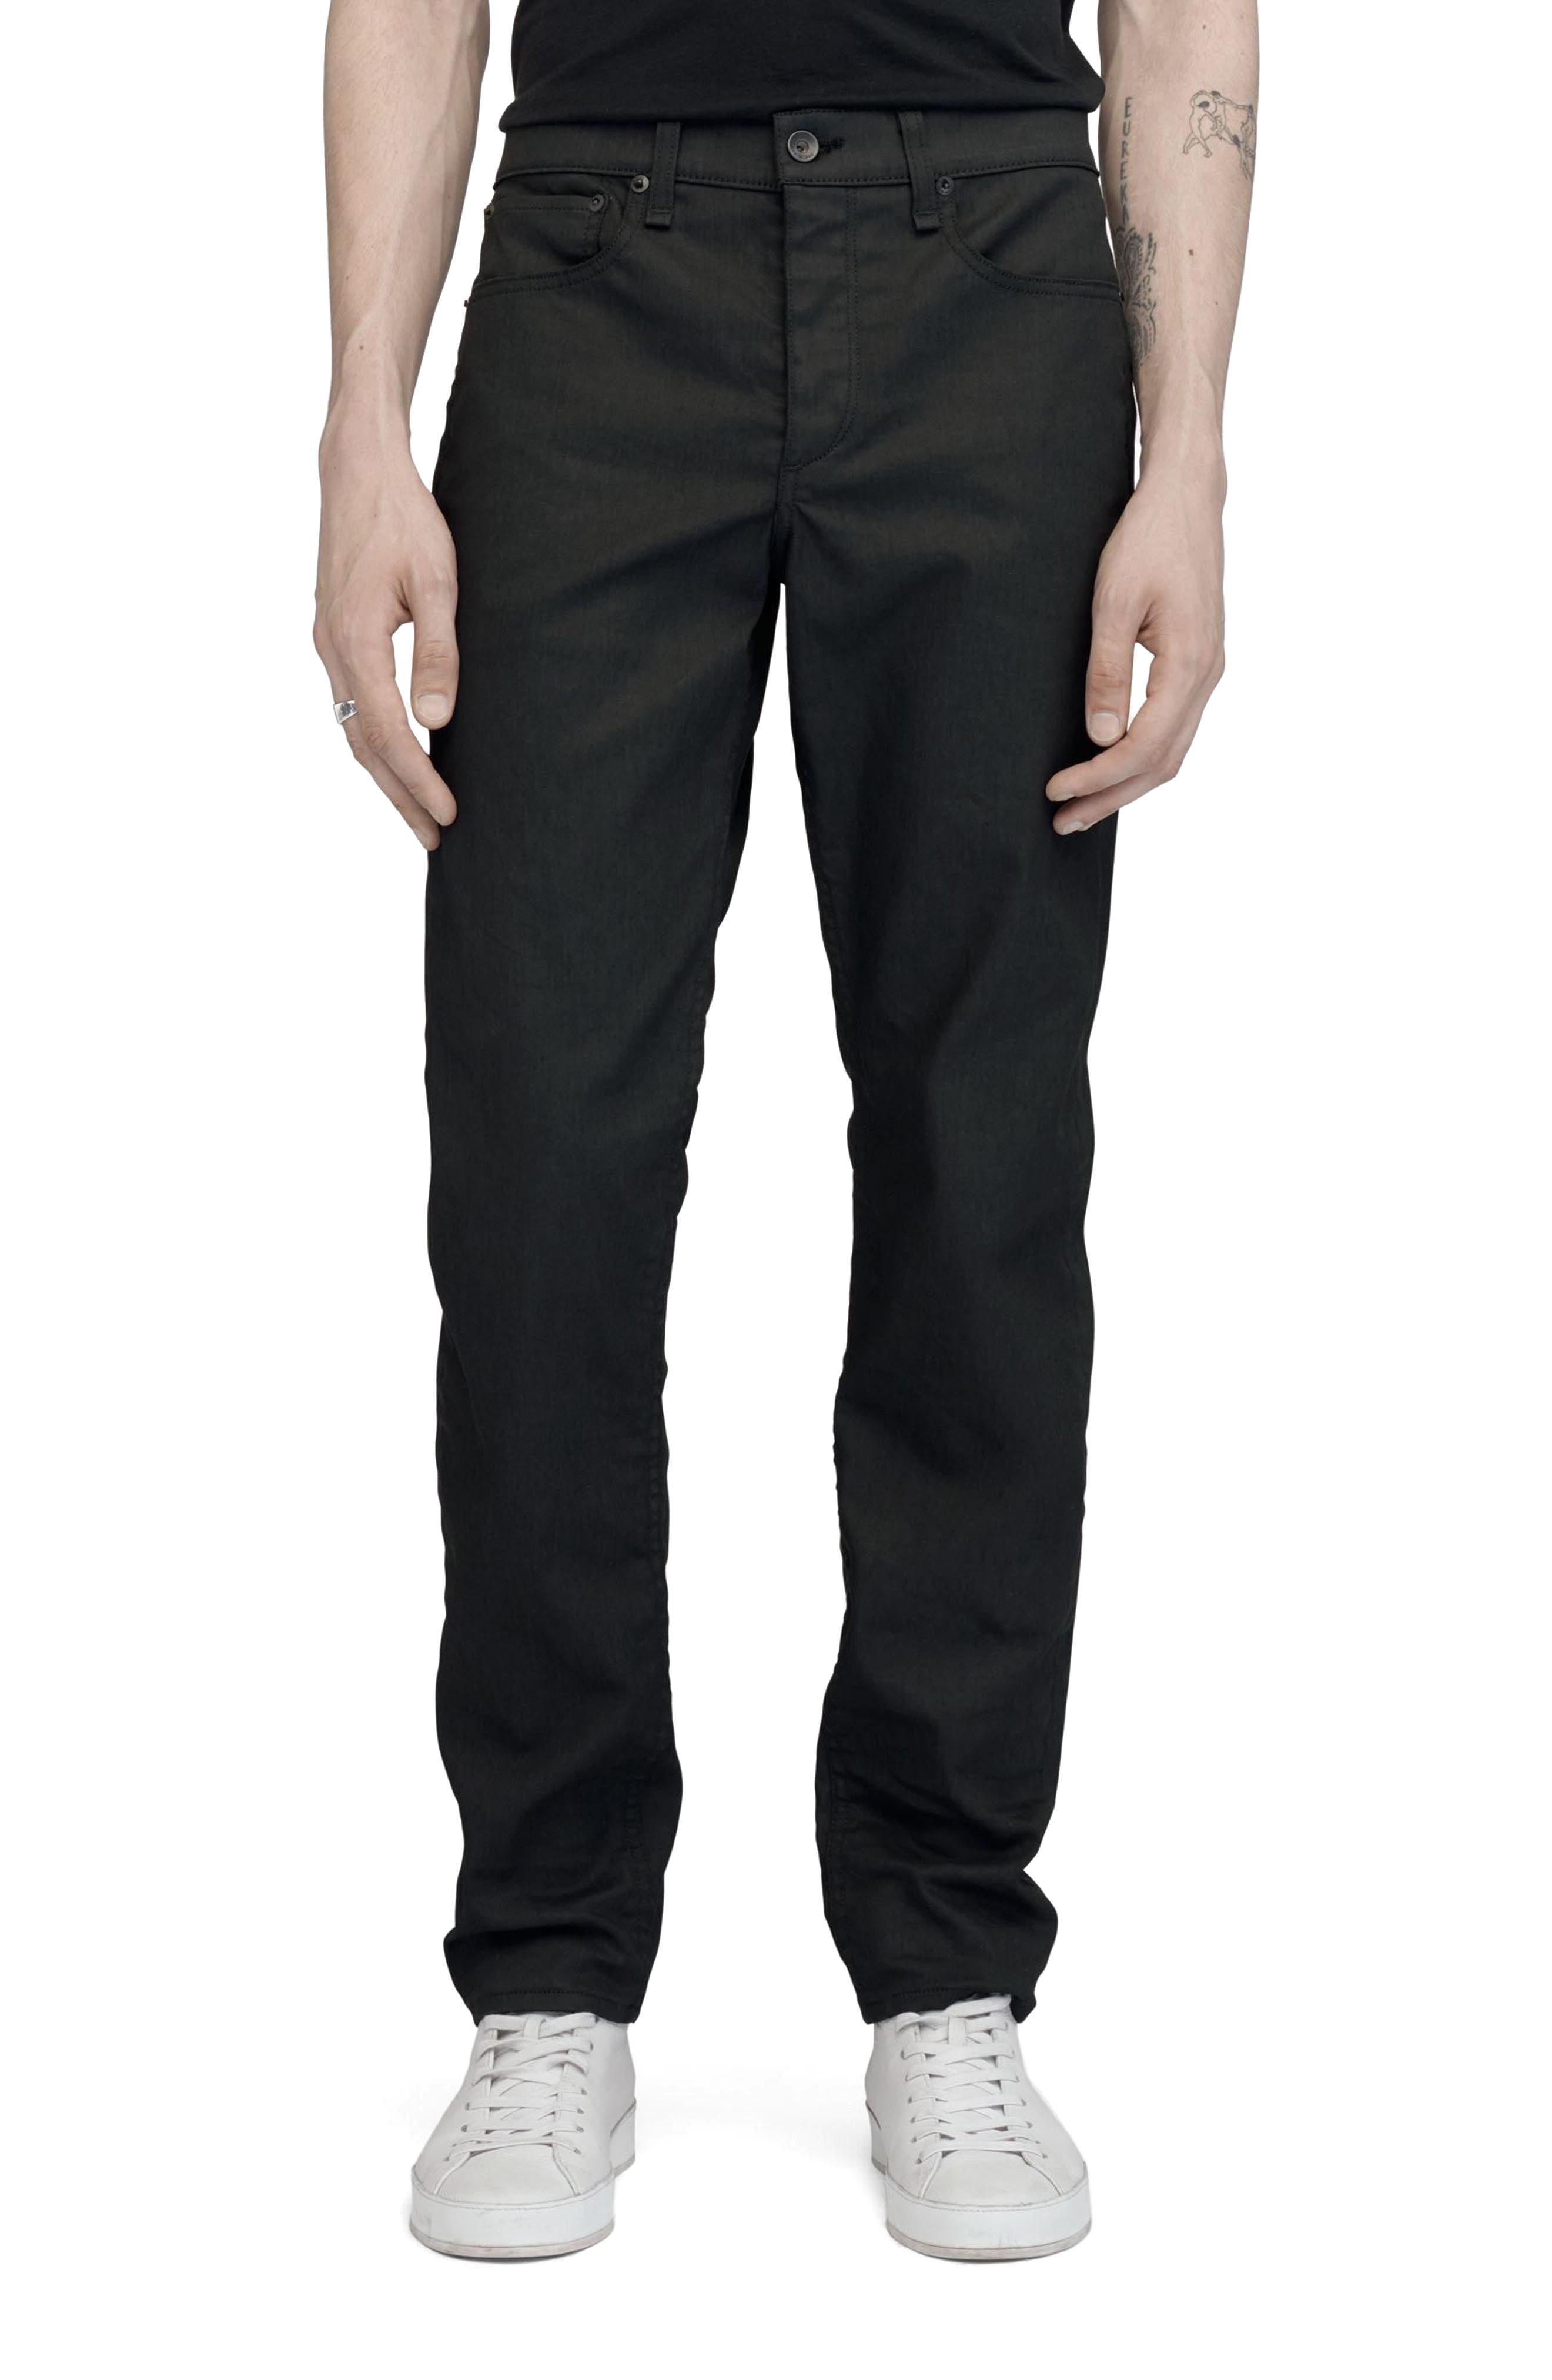 Fit 2 Slim Fit Jeans,                         Main,                         color, Coated Black